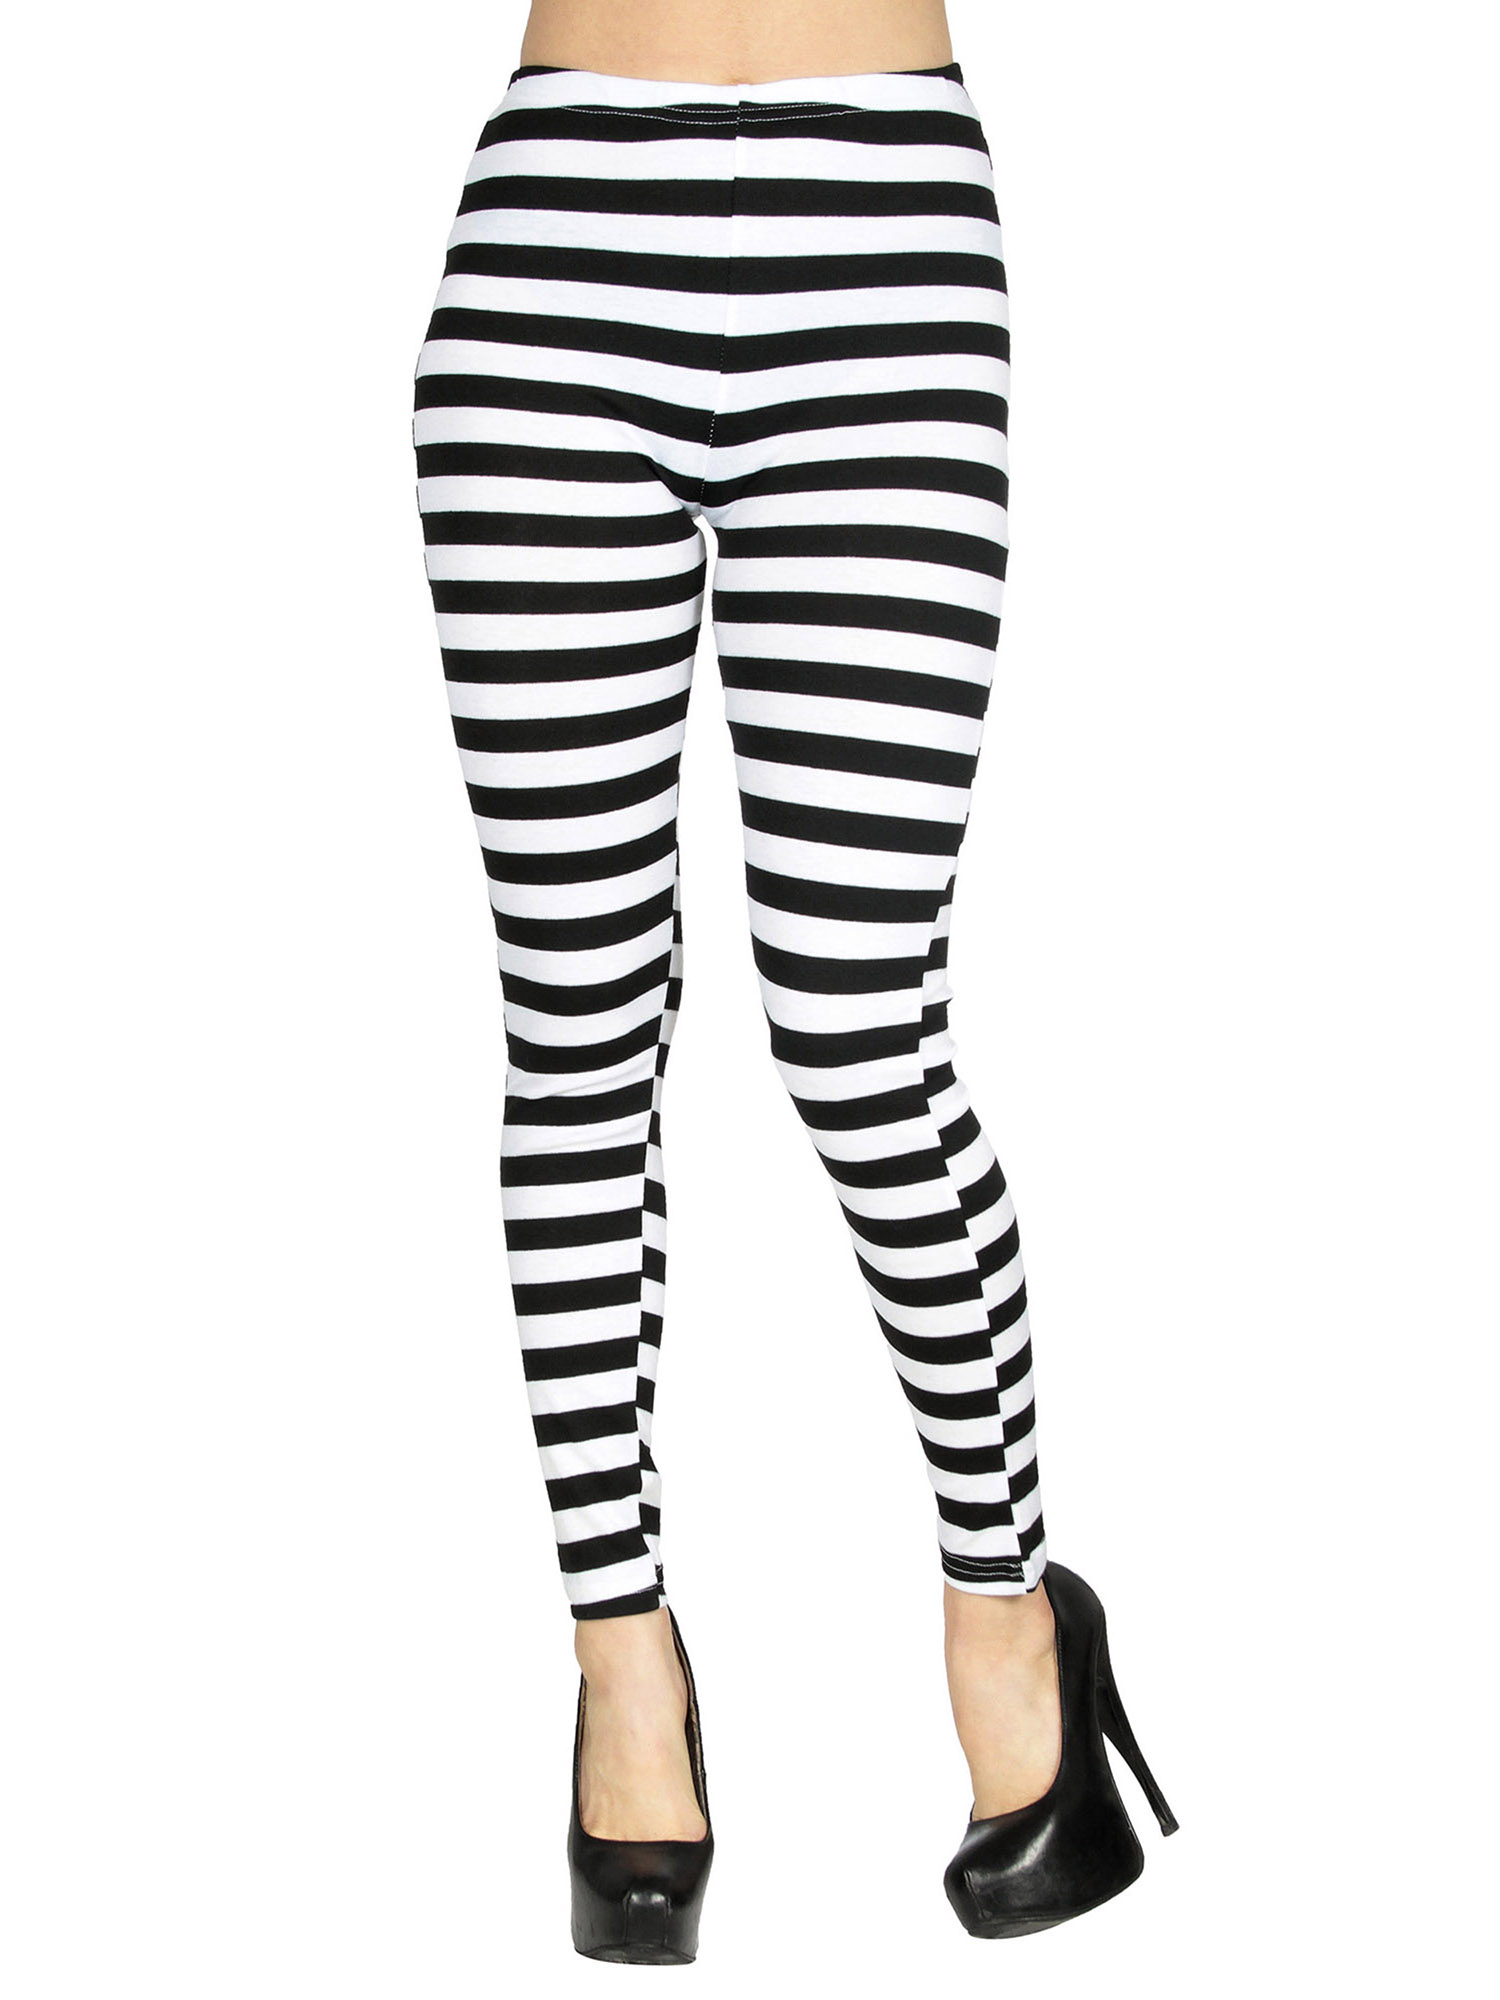 BASILICA - Women's Soft Black White Horizontal Striped Leggings w